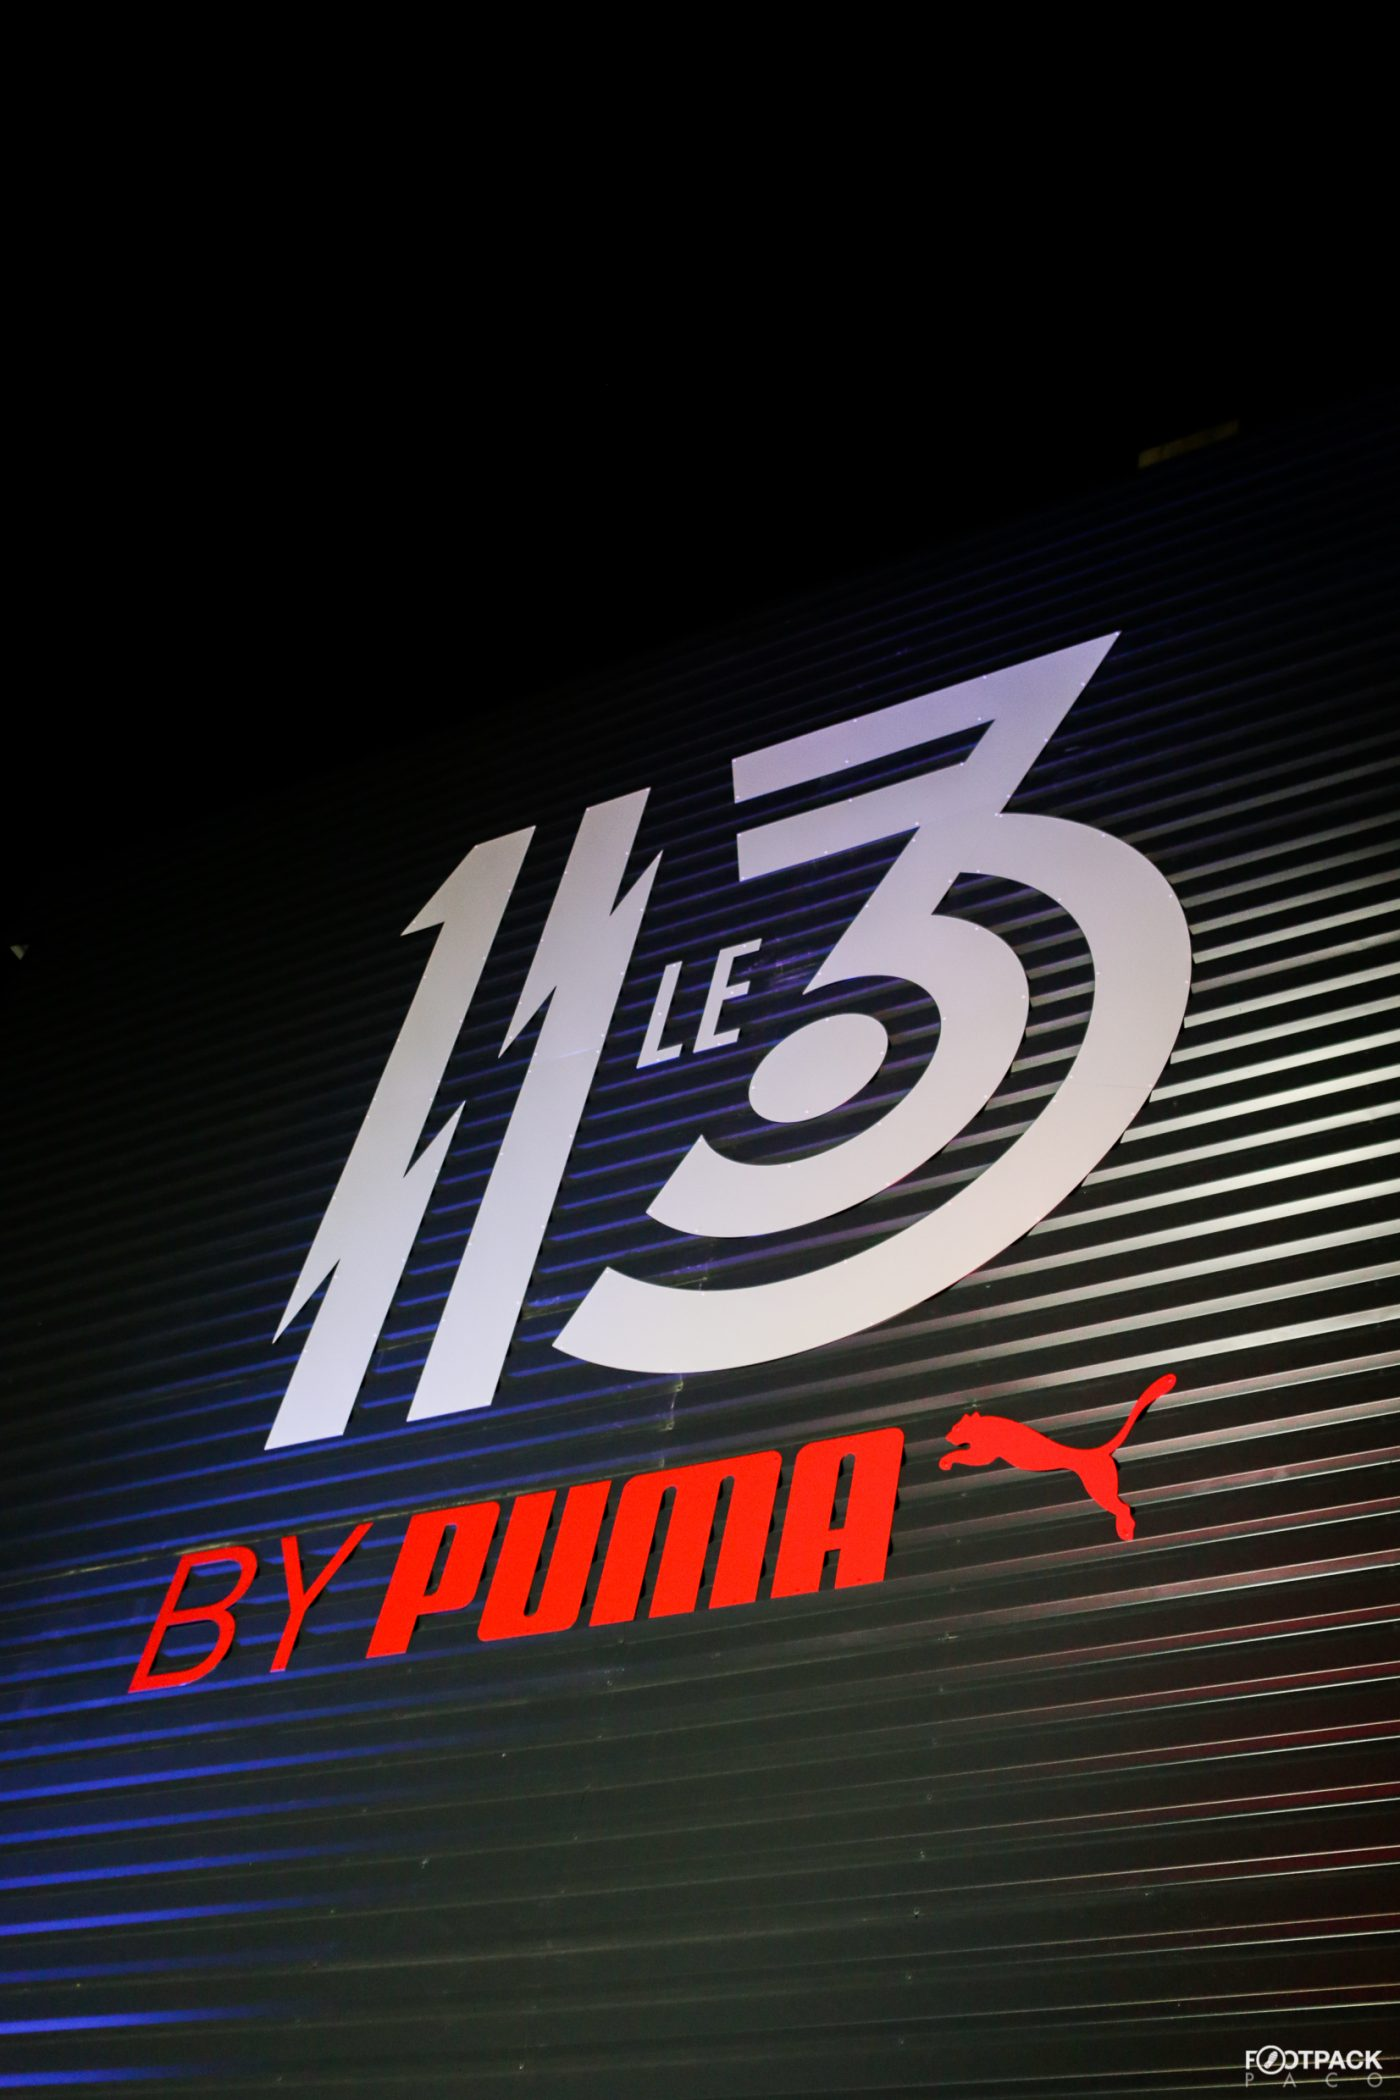 puma-power-up-night-marseille-footpack-février-2019-3puma-power-up-night-marseille-footpack-février-2019-3